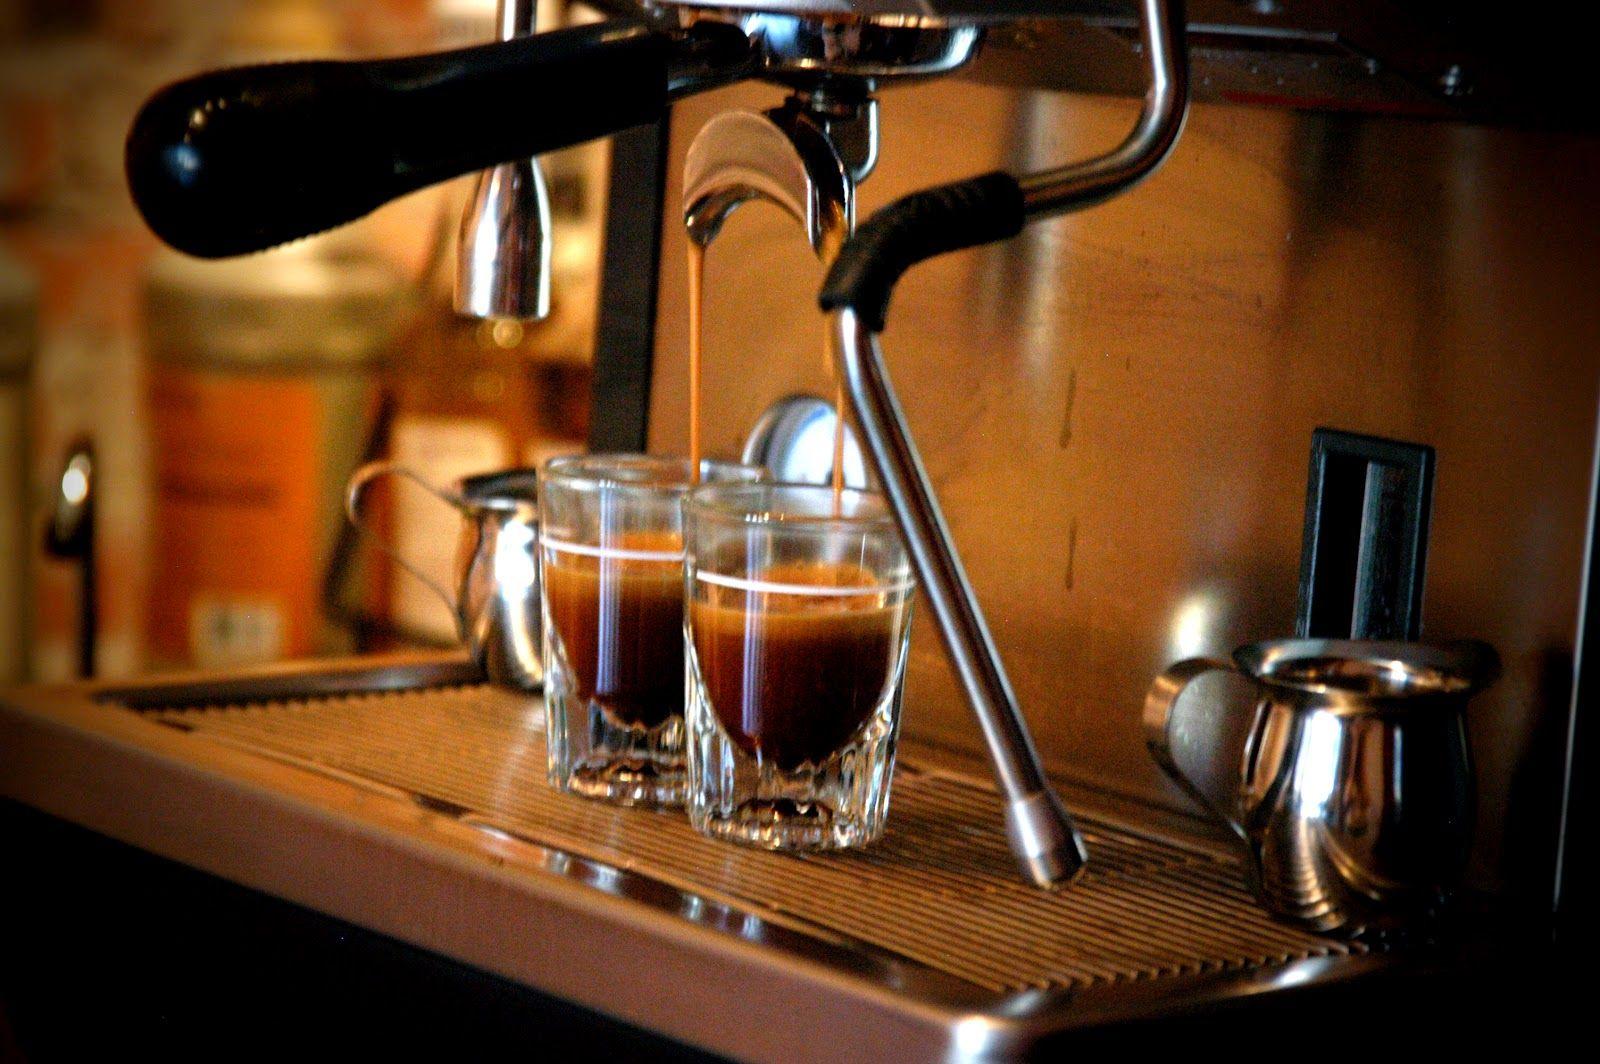 expresso coffee machine wallpaper - Google Search   Espresso cafe, Espresso machine, Coffee